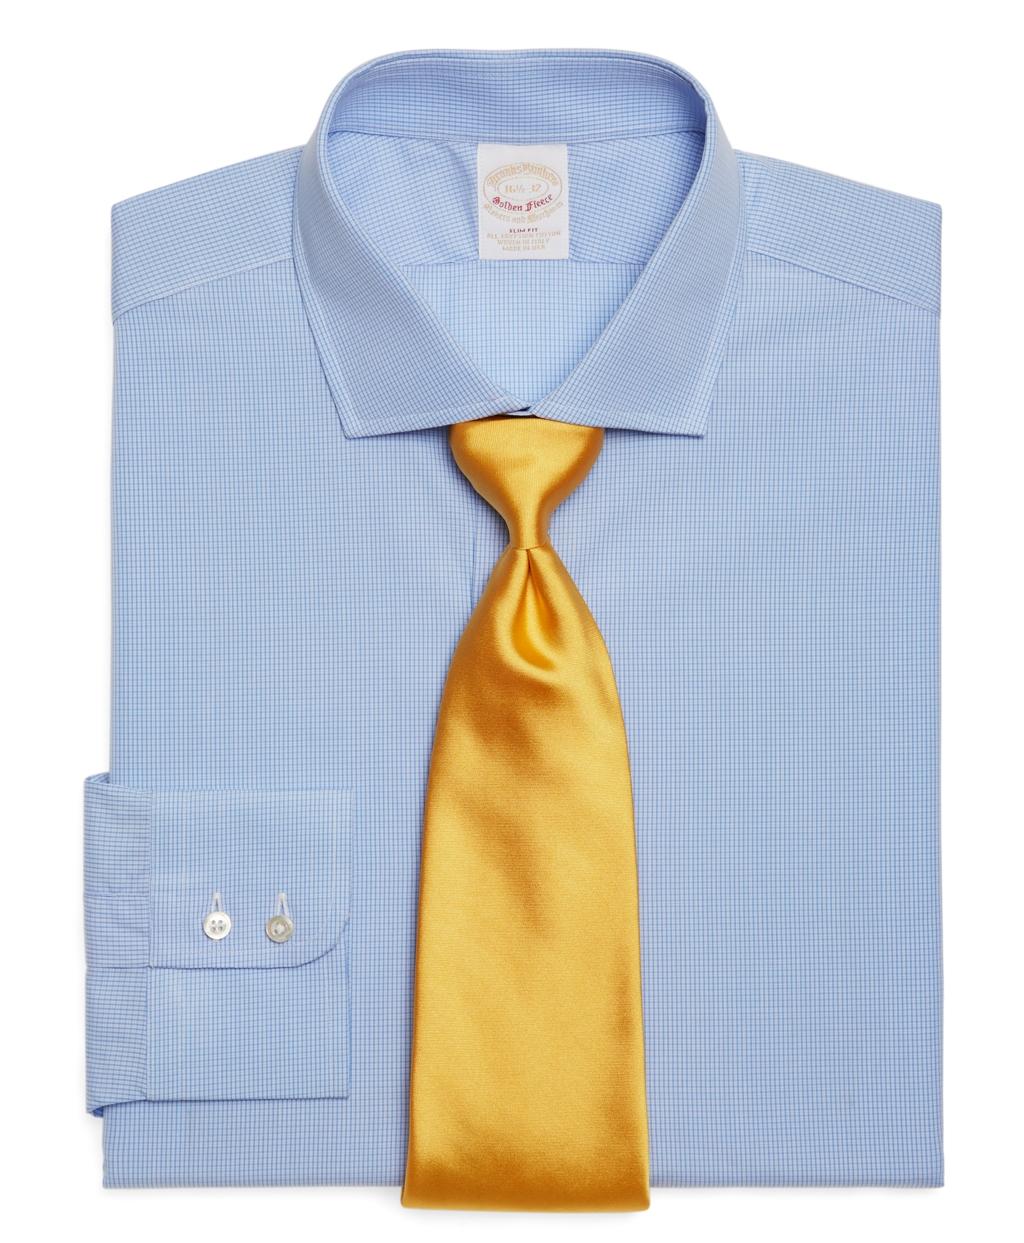 Brooks brothers golden fleece allcotton slim fit fine for Brooks brothers dress shirt fit guide